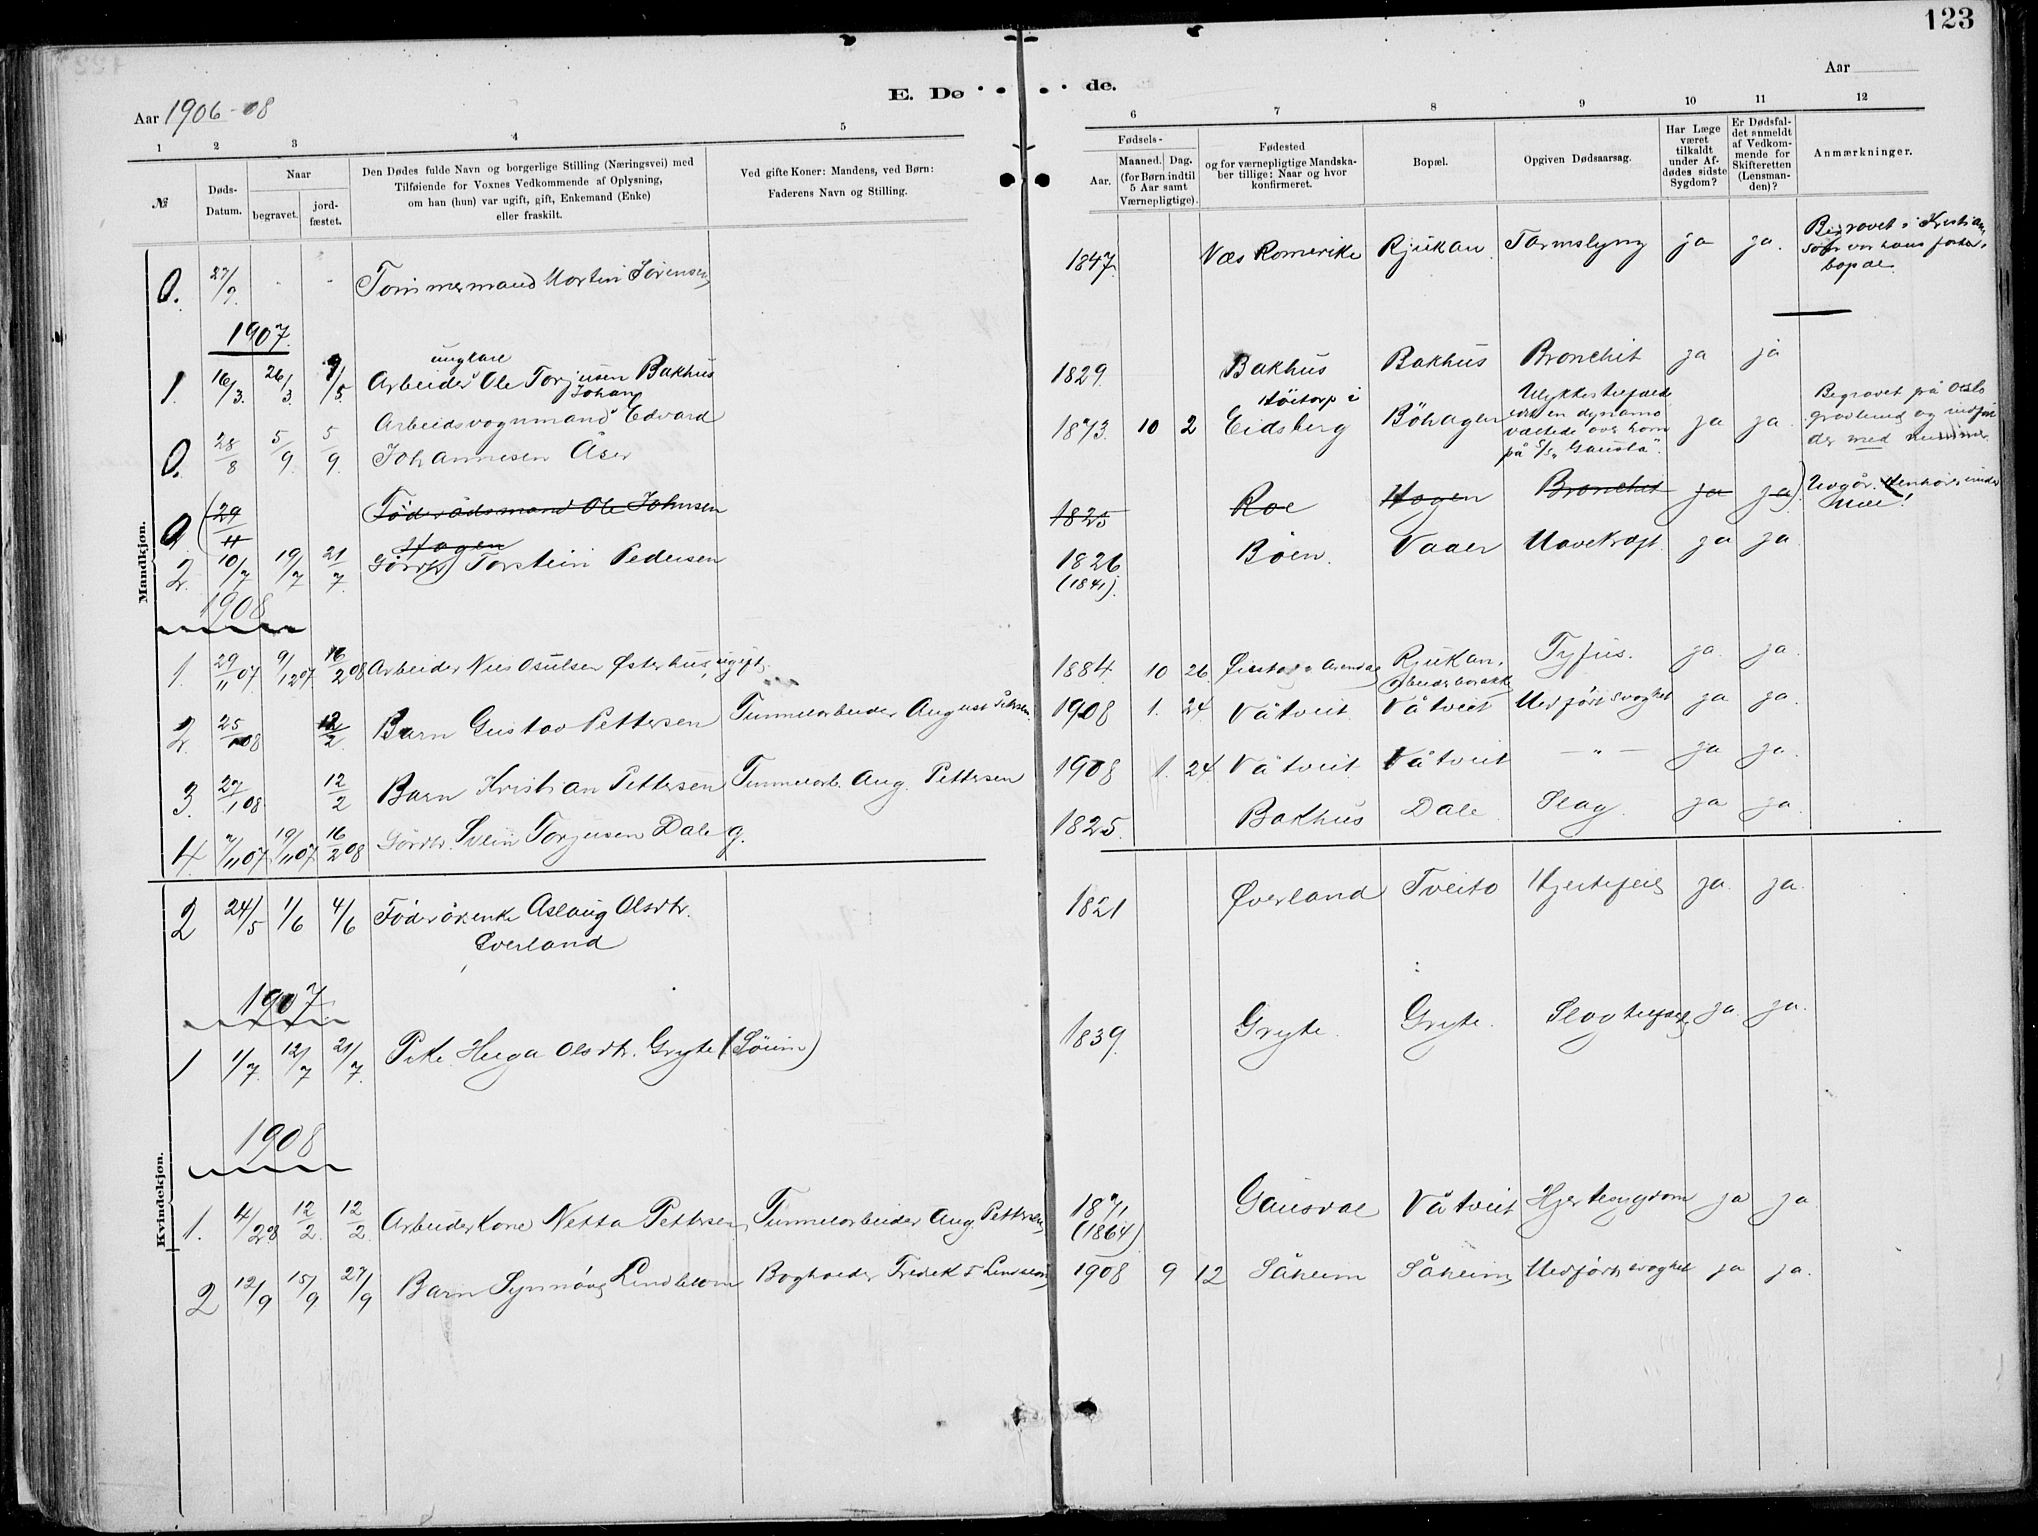 SAKO, Rjukan kirkebøker, F/Fa/L0001: Ministerialbok nr. 1, 1878-1912, s. 123